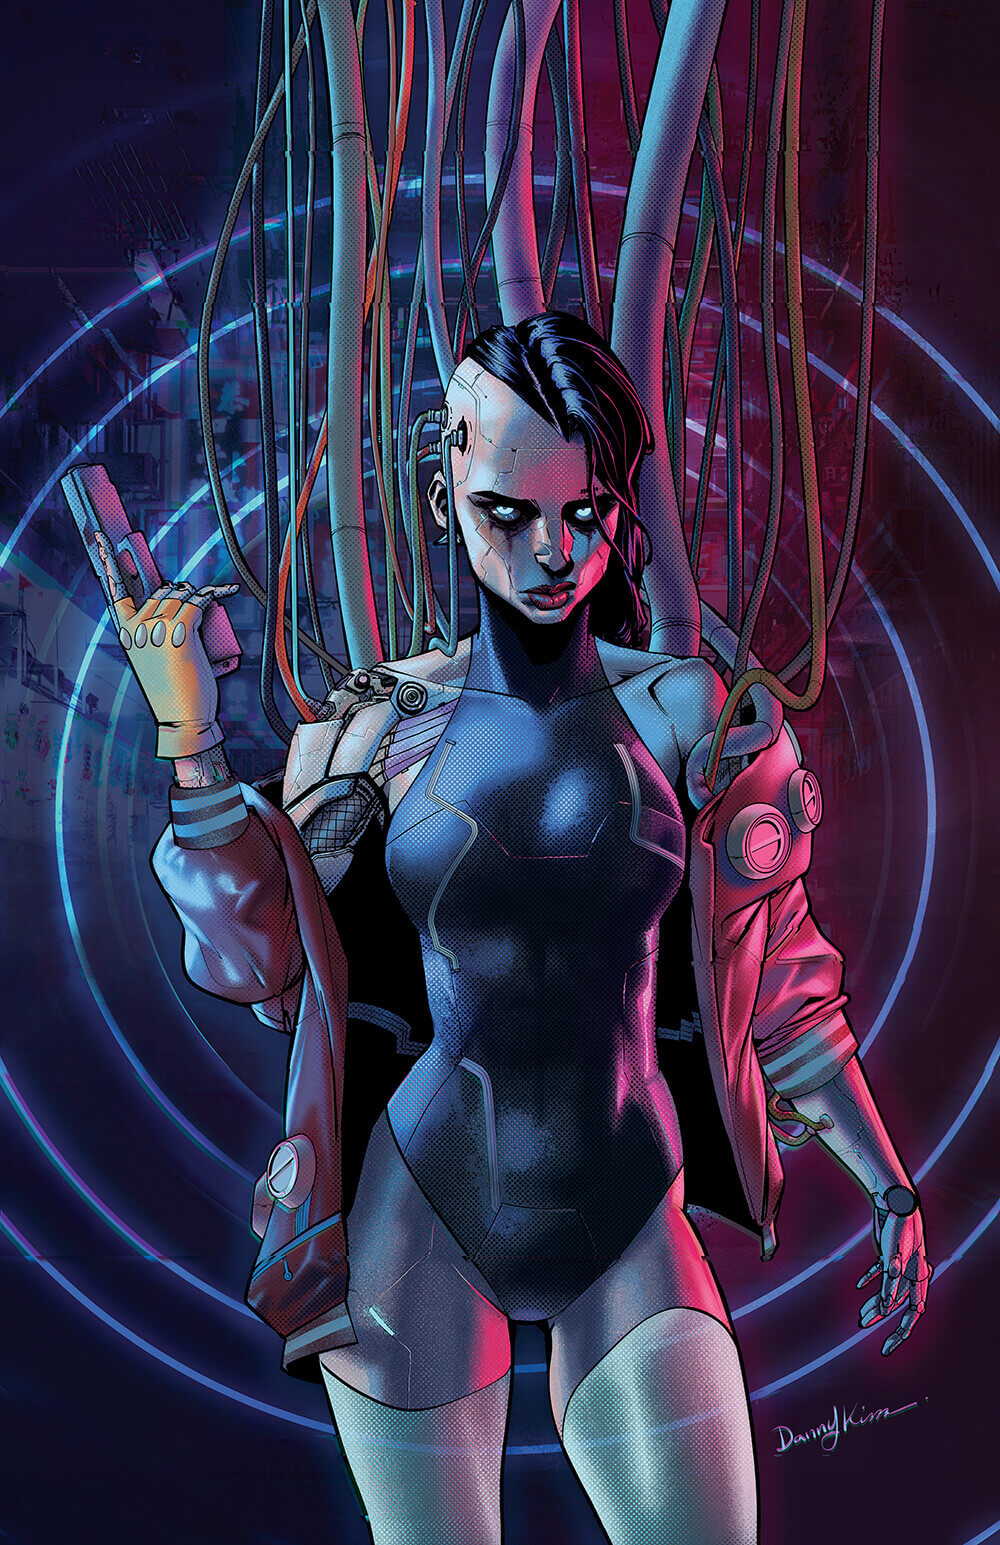 Danny Kim – Cyborg girl